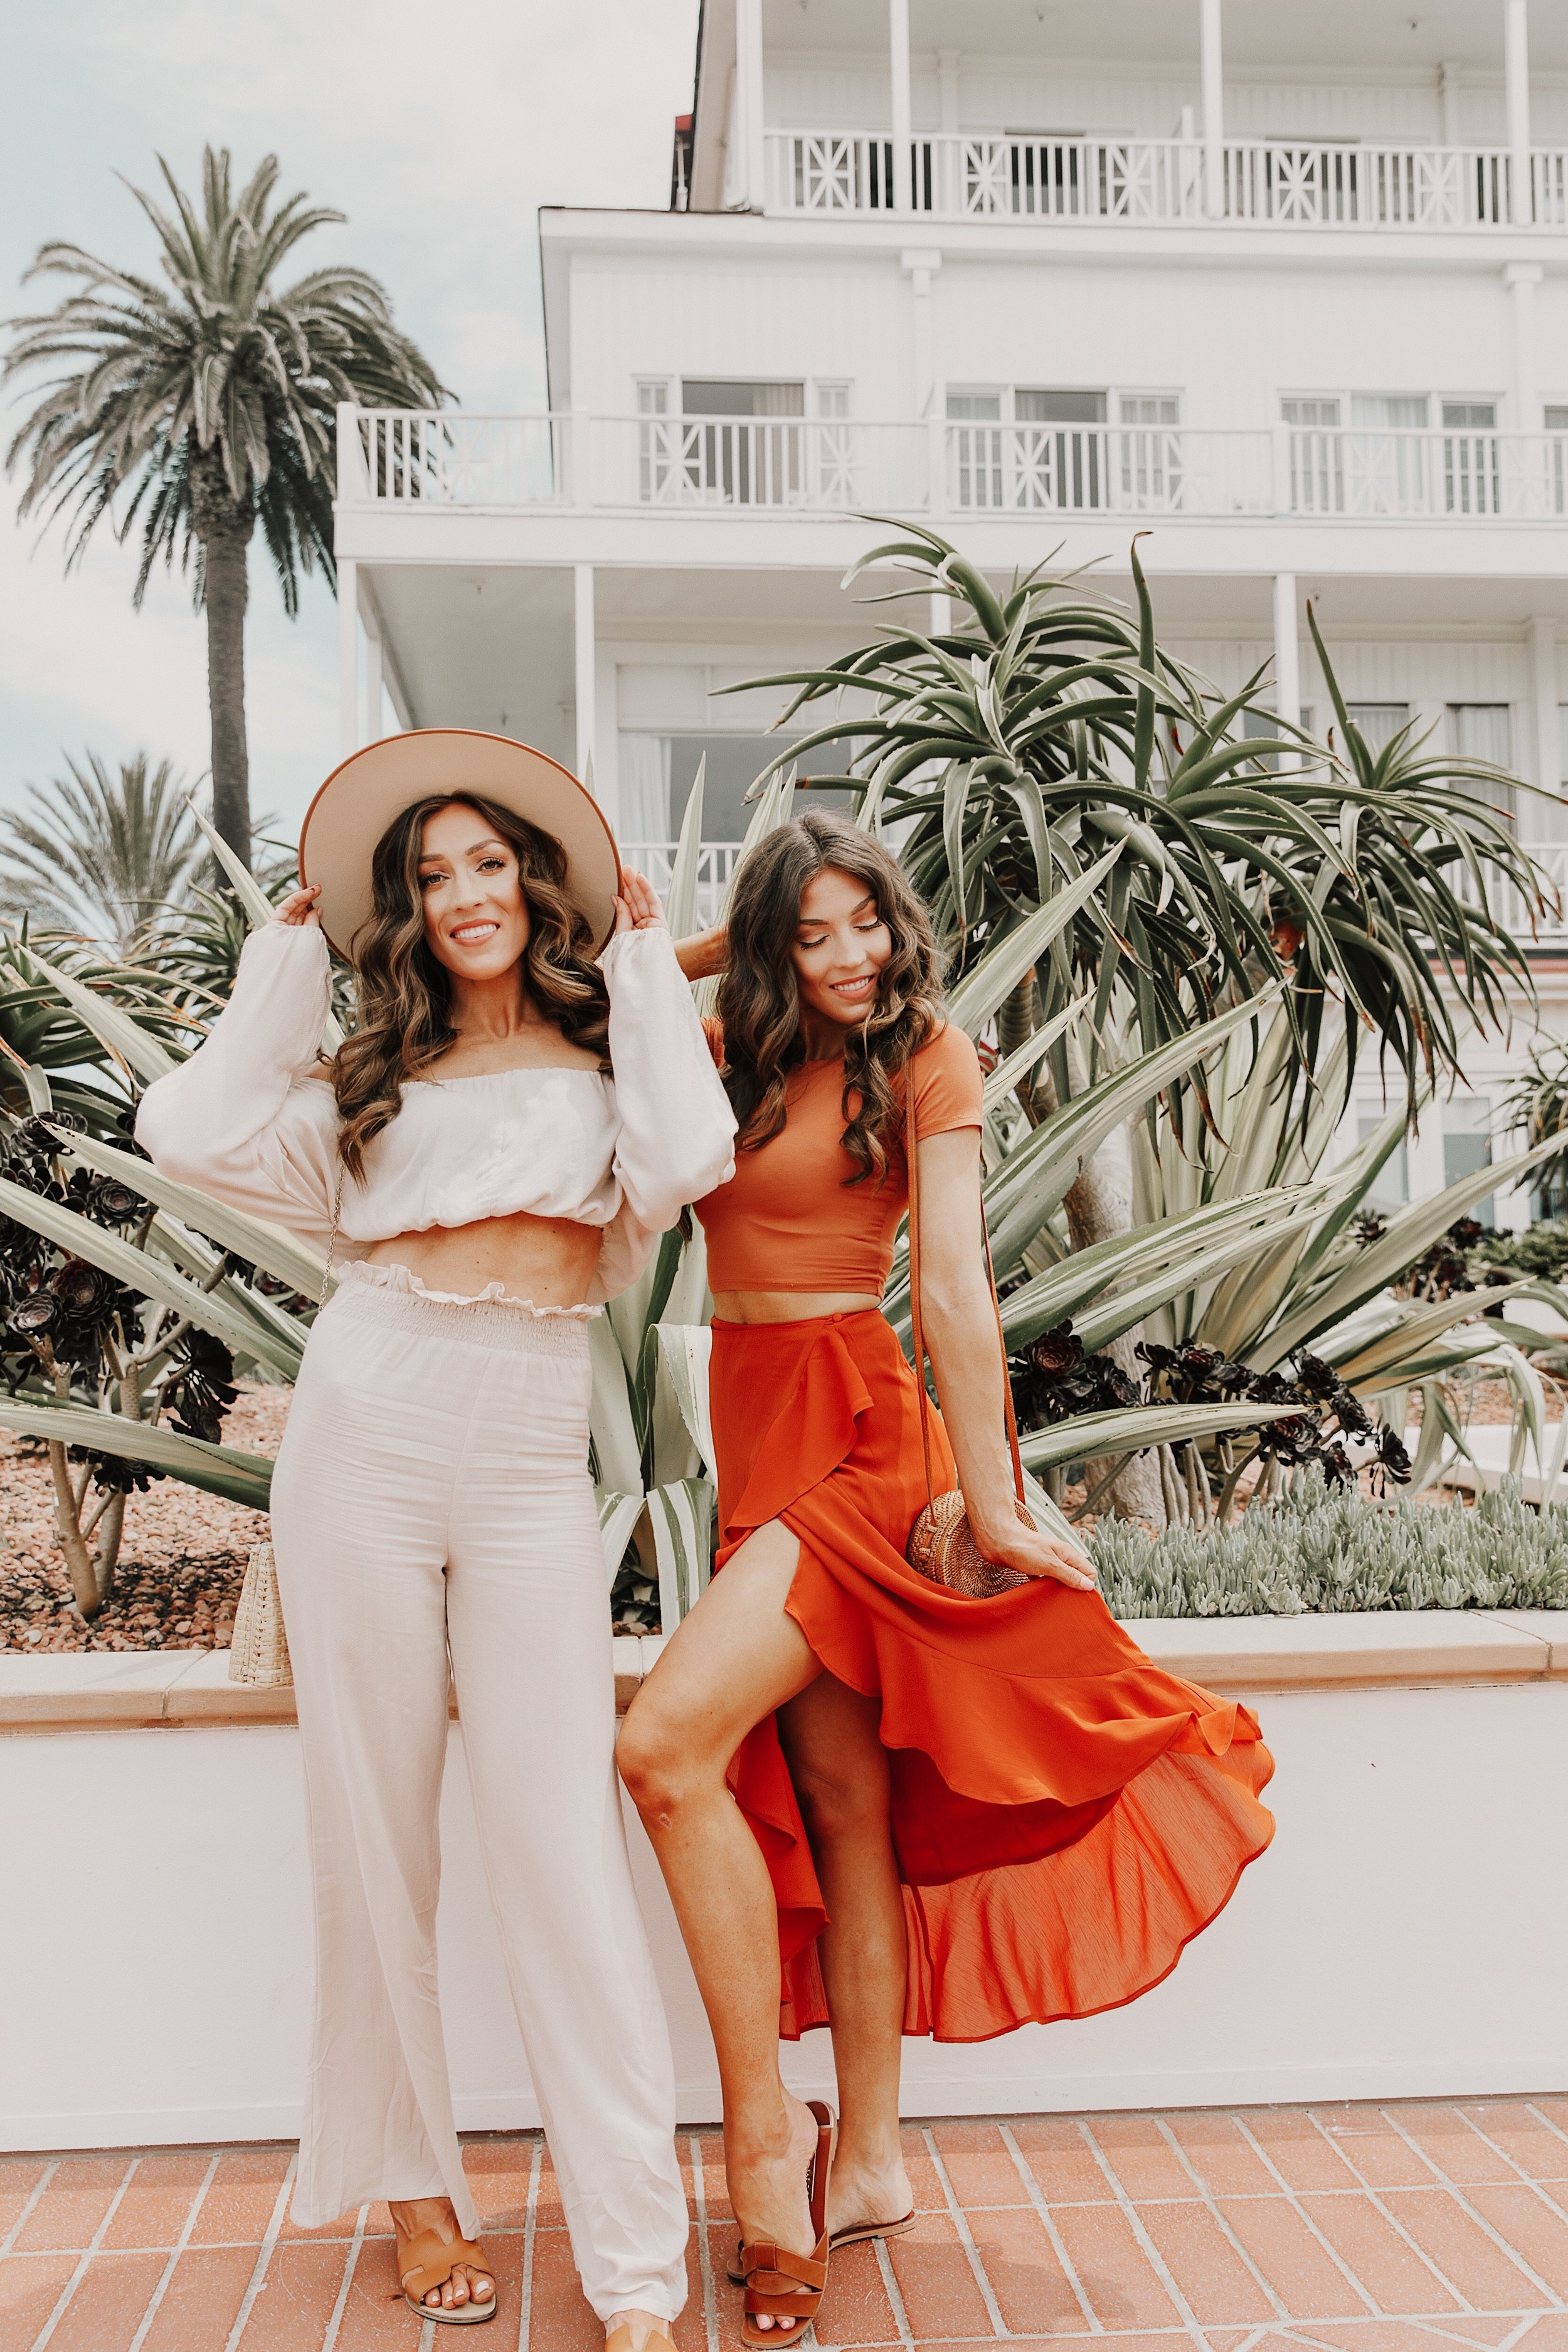 Resort Wear Revolve The Del Coronado 8.JPG